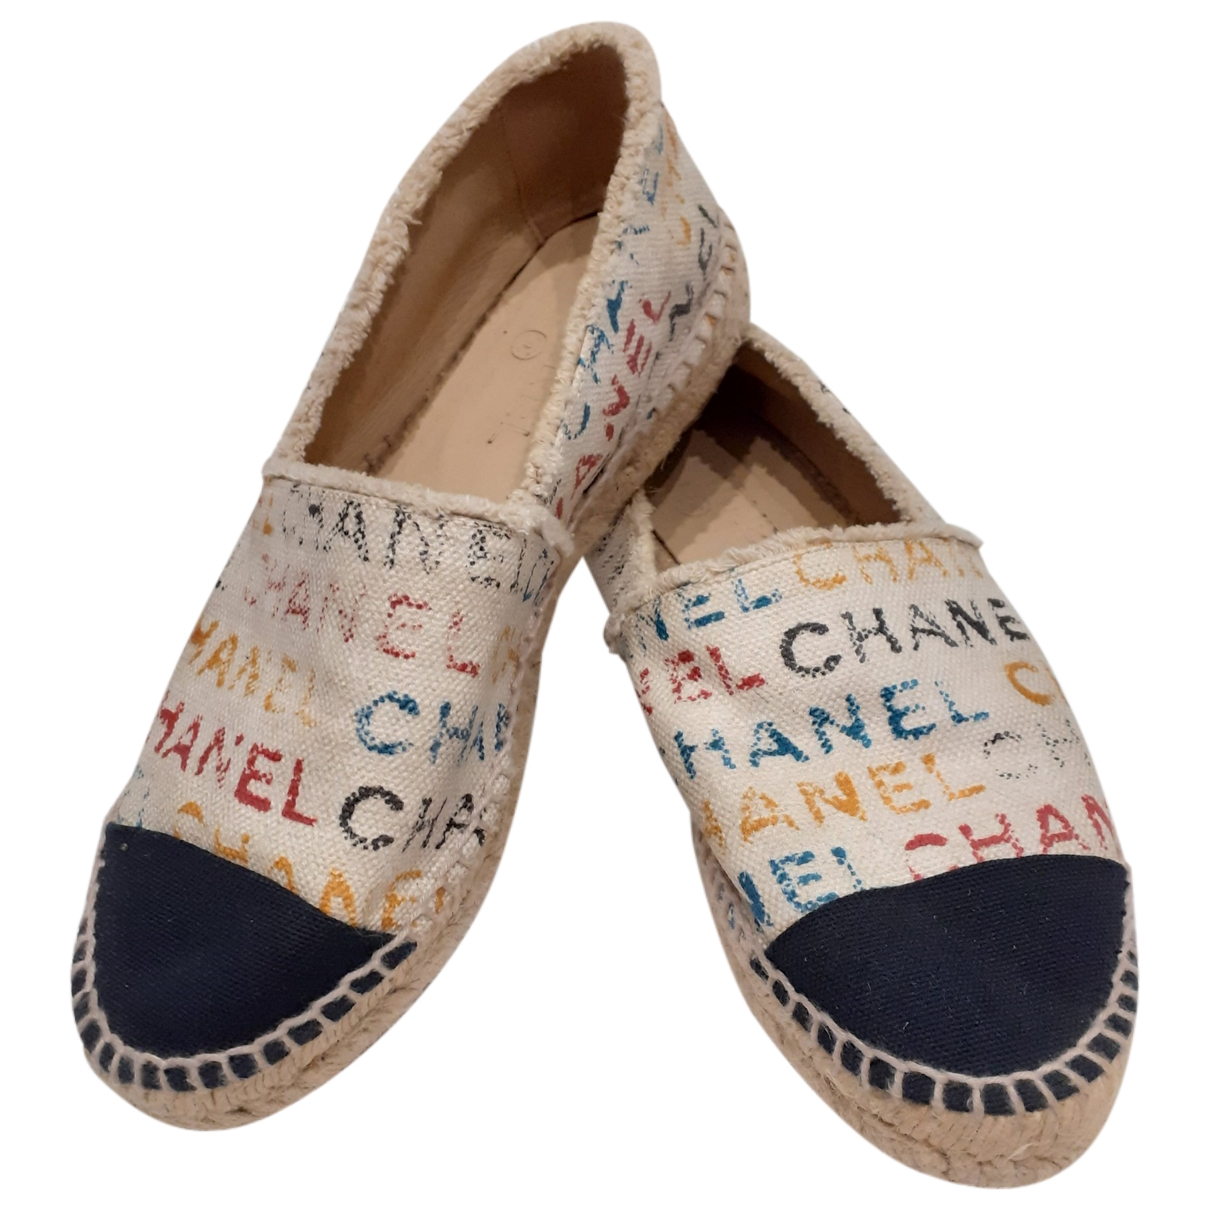 Chanel \N Espadrilles in  Bunt Leinen